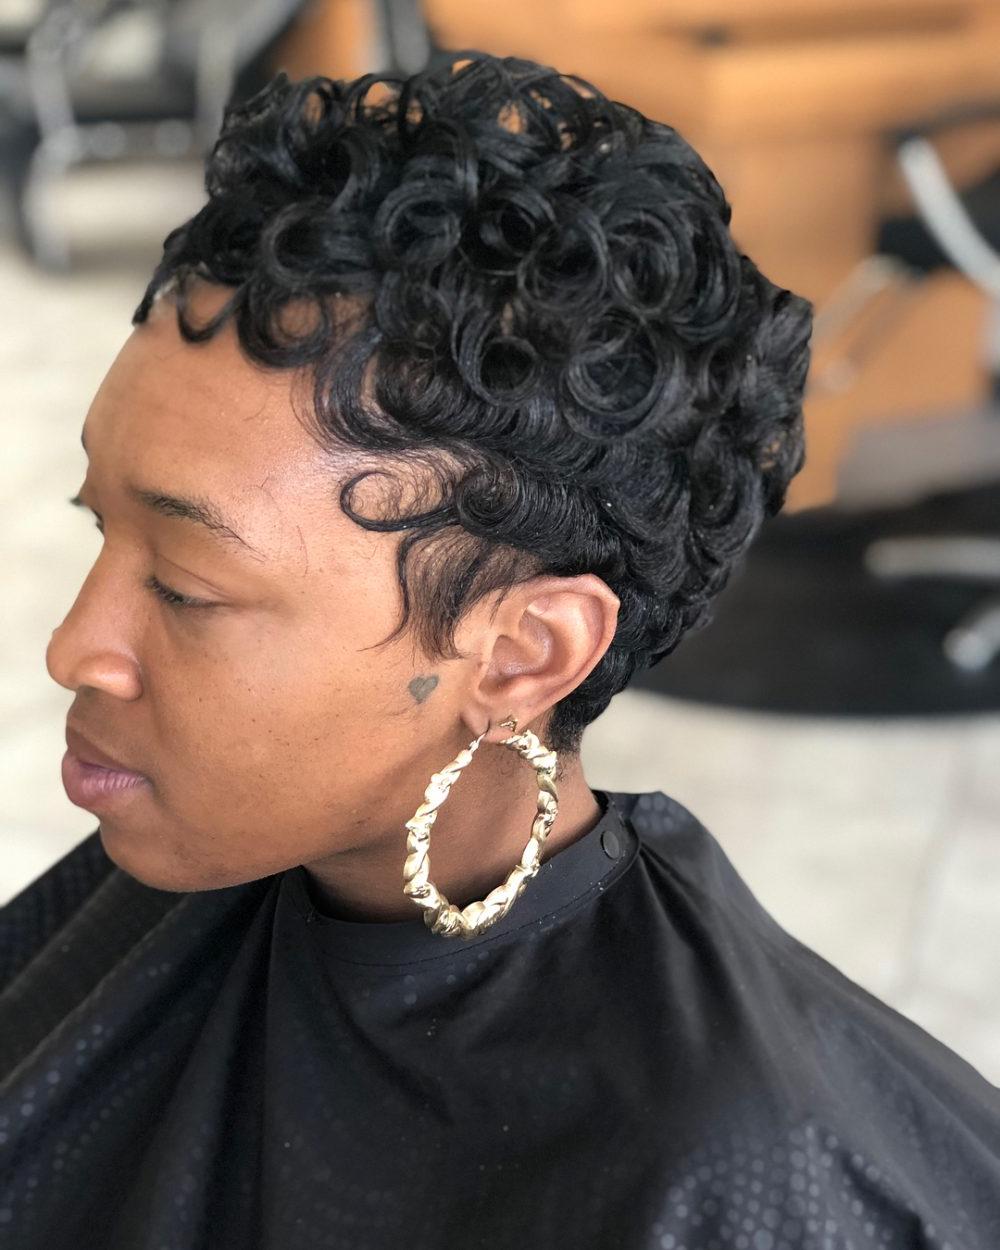 54 Easy Short Hairstyles For Black Women Regarding Soft Short Hairstyles For Black Women (View 3 of 25)